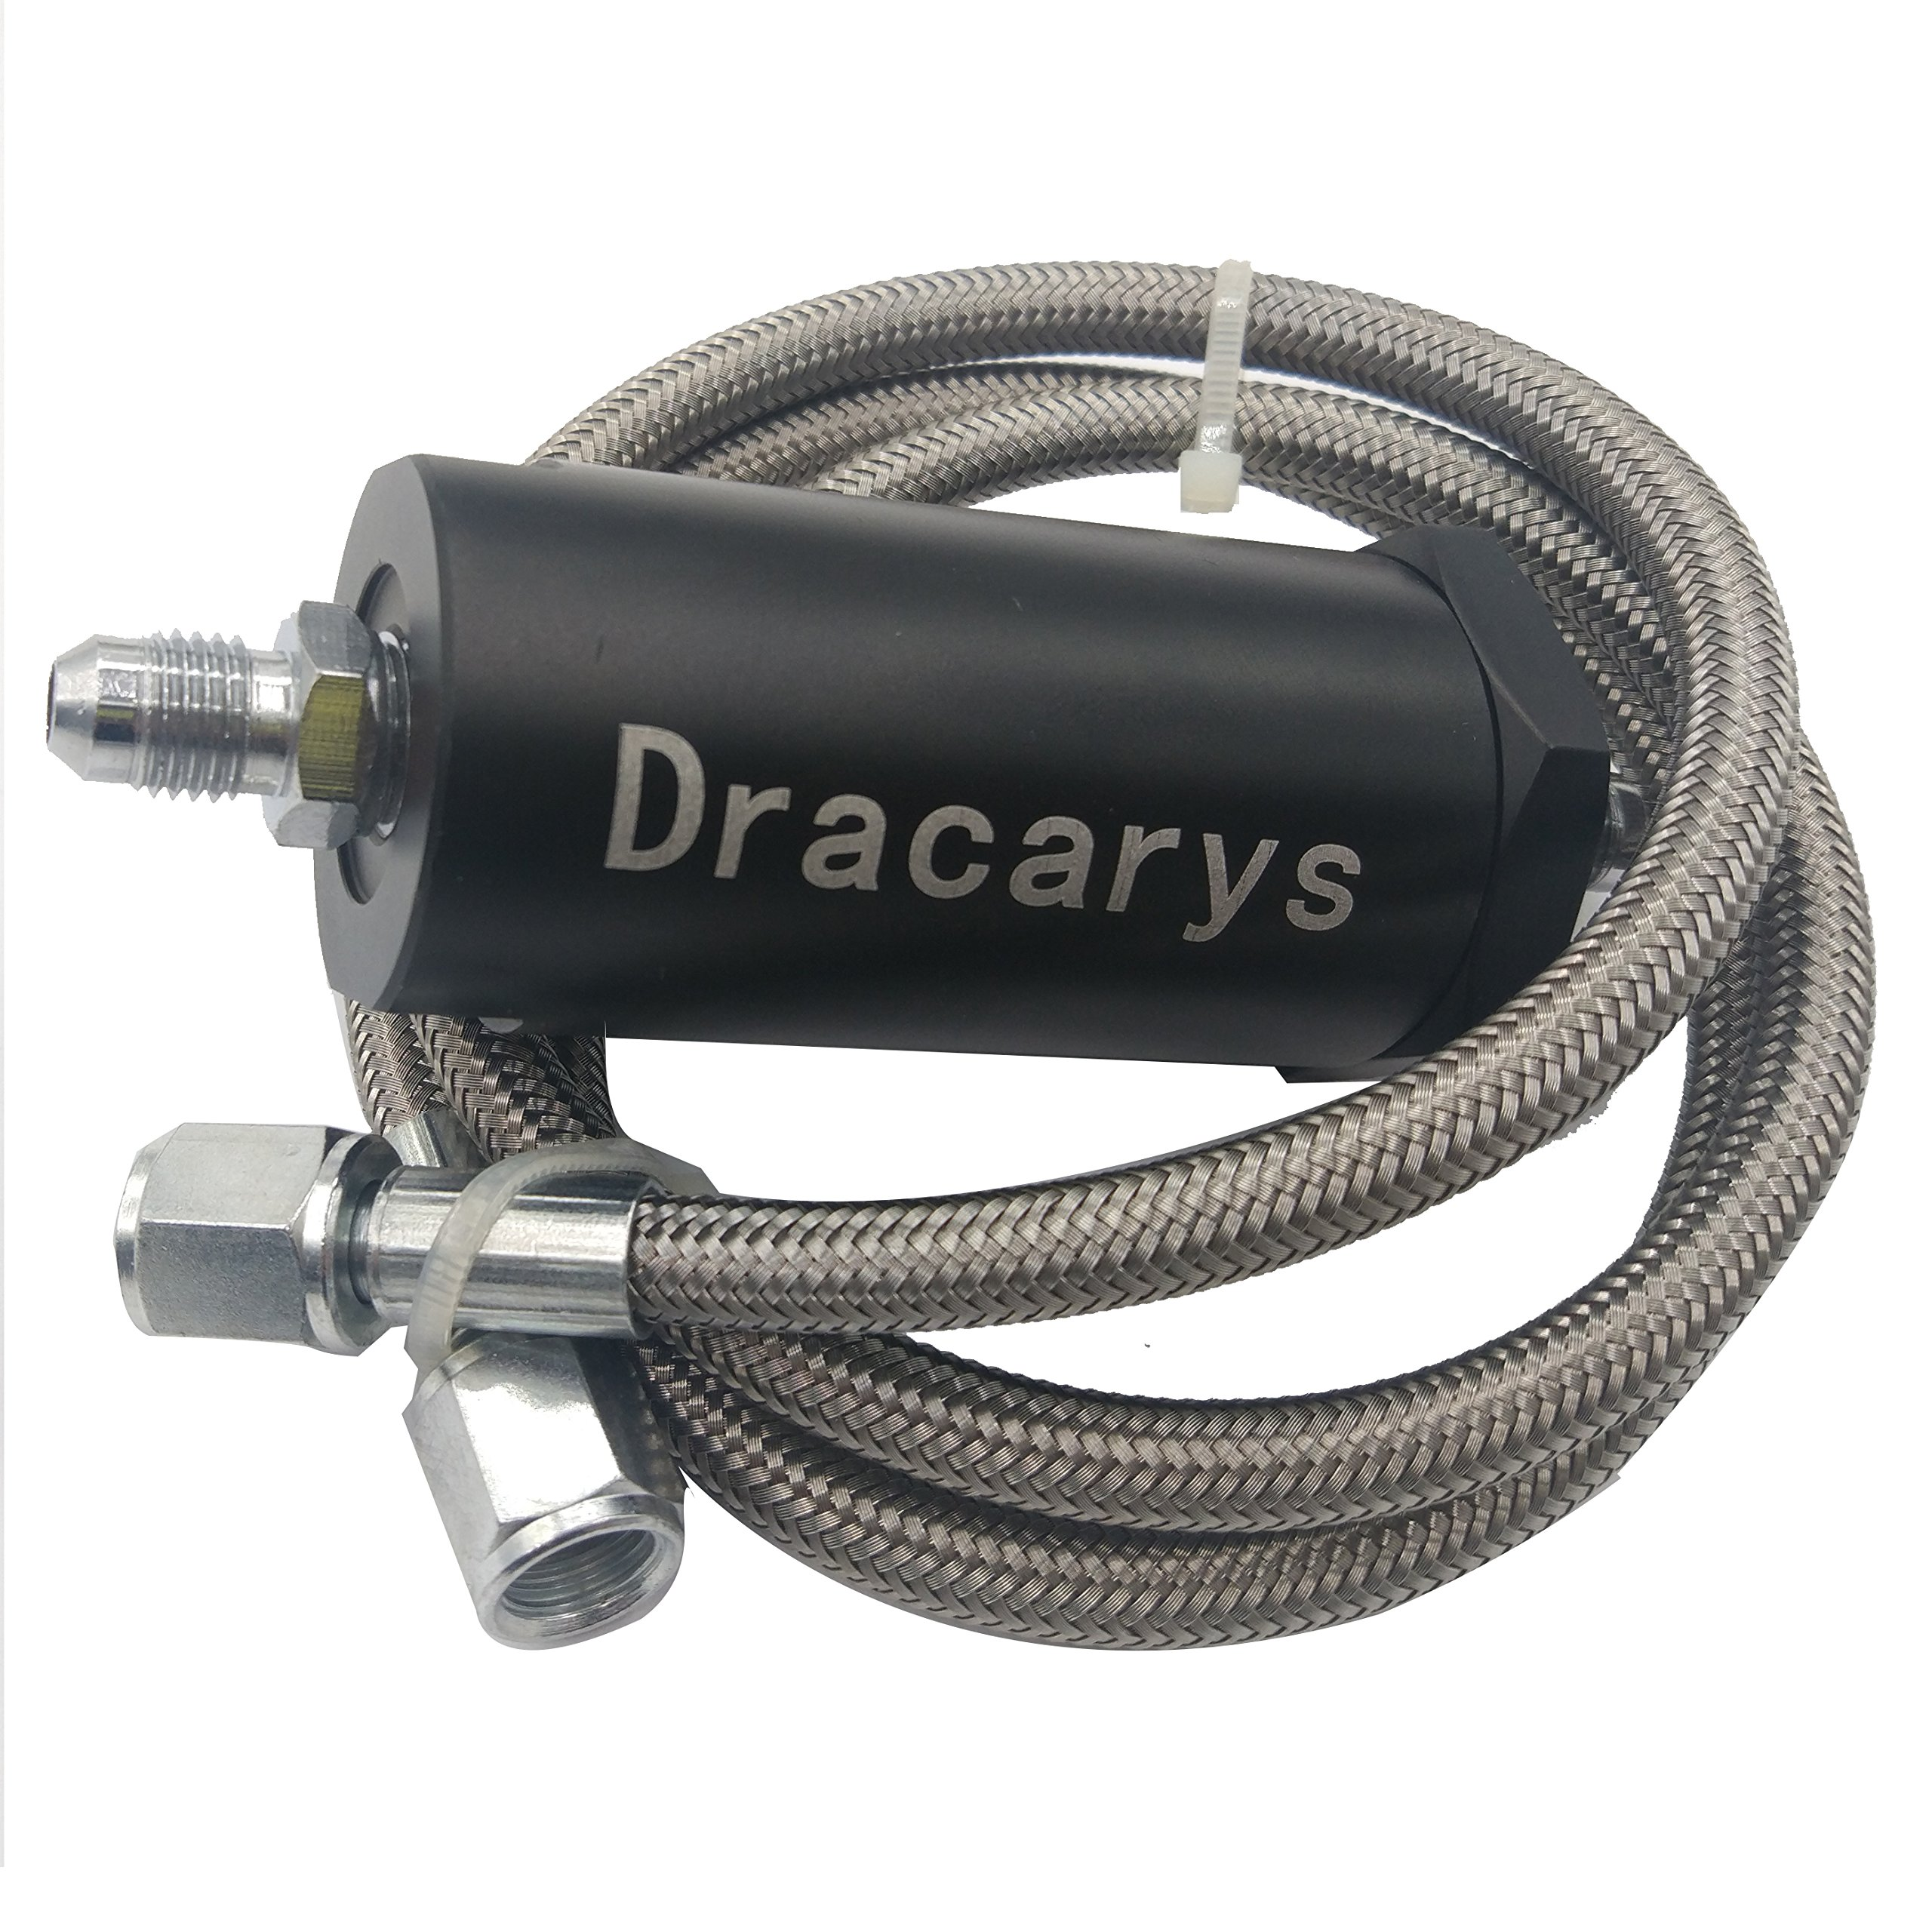 Dracarys Nitrous Outlet Inline Nitrous Oxide Filters (4AN)